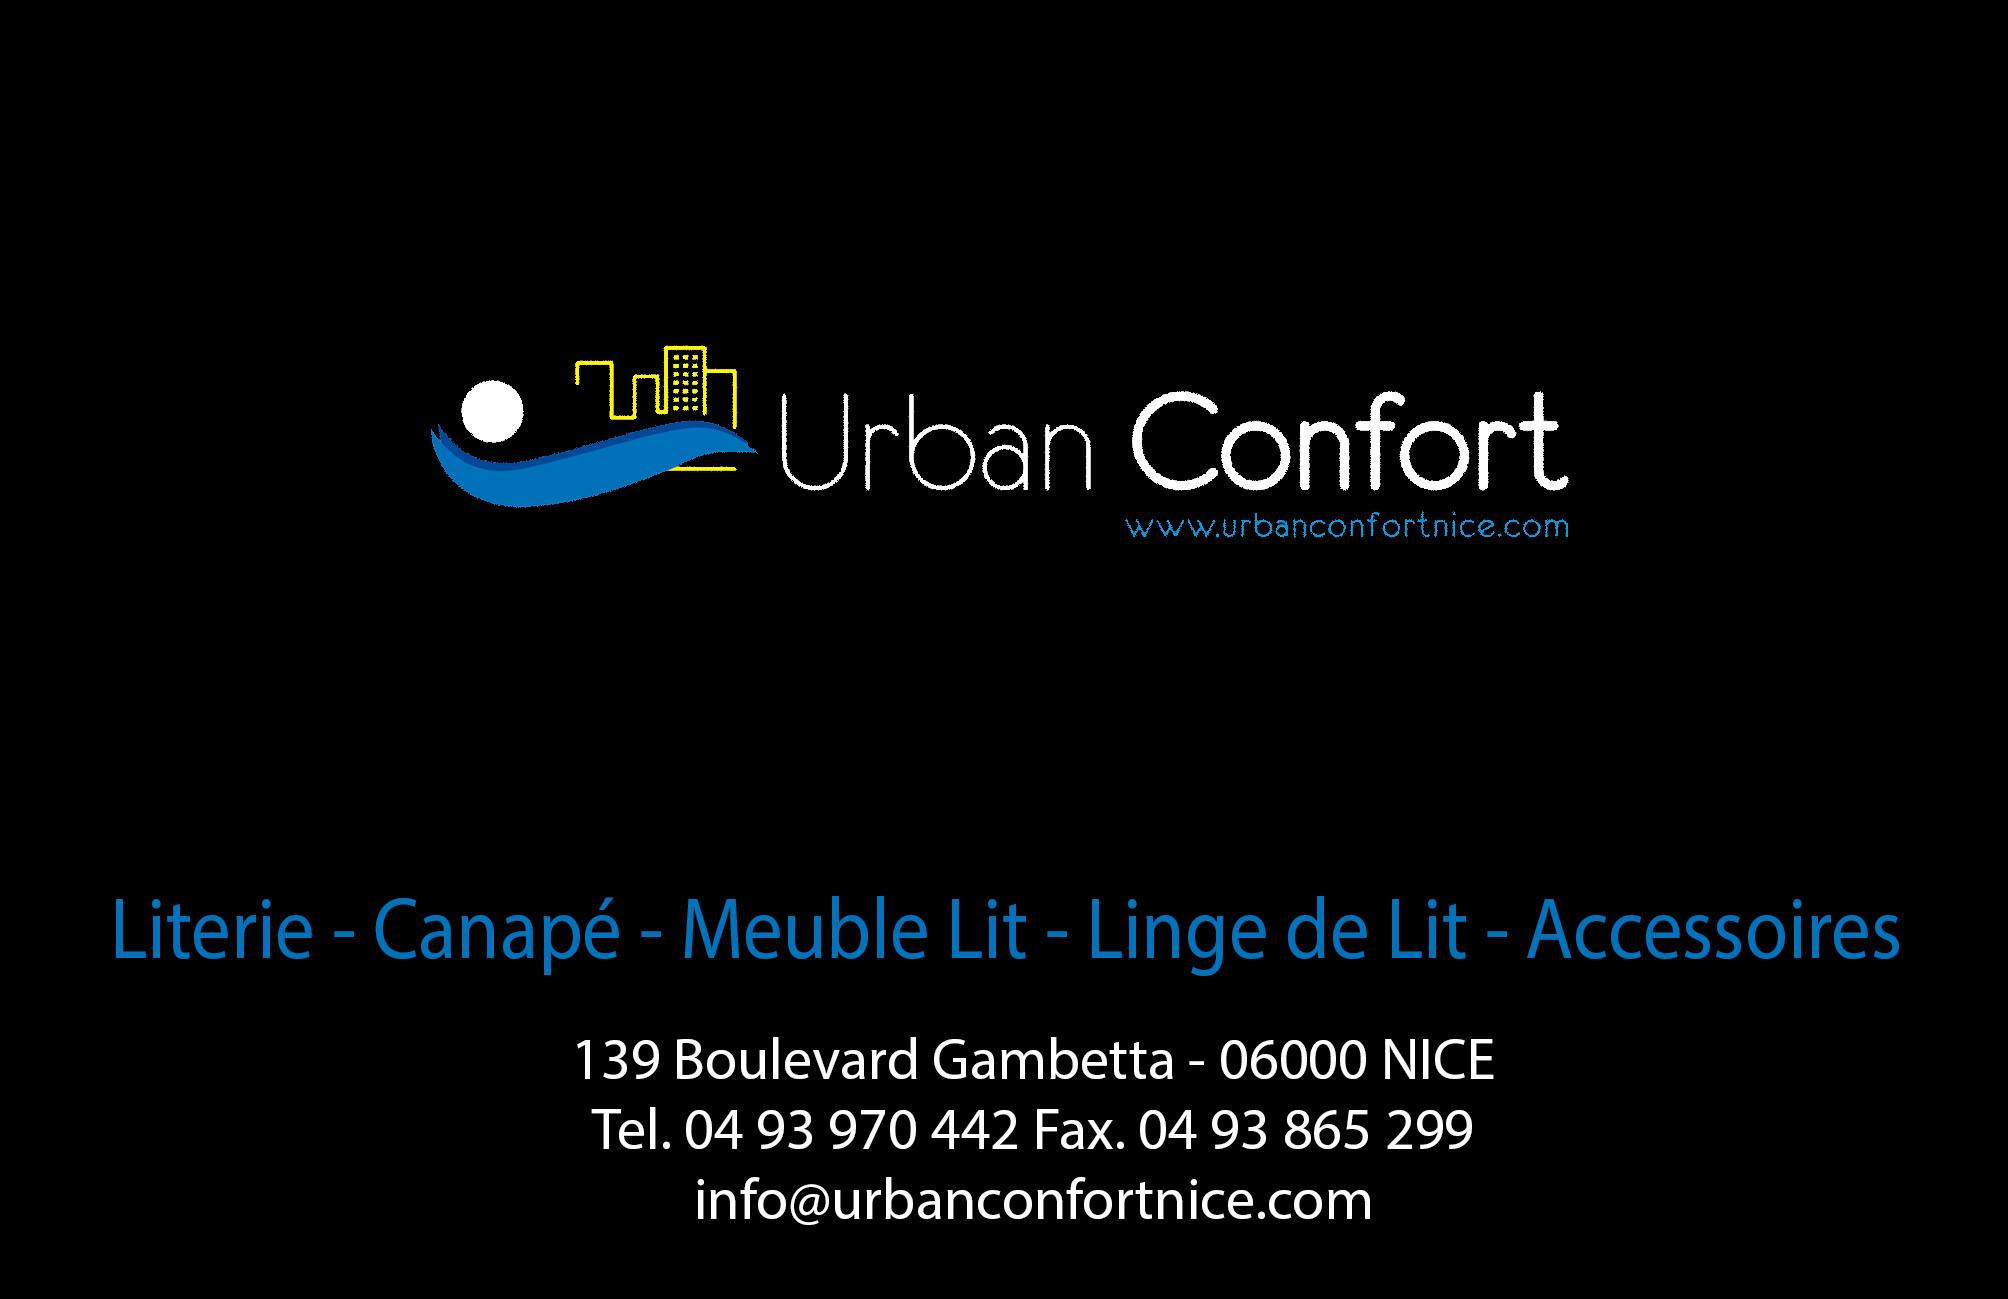 fournisseur literie d corateur int rieur urban confort nice 06. Black Bedroom Furniture Sets. Home Design Ideas